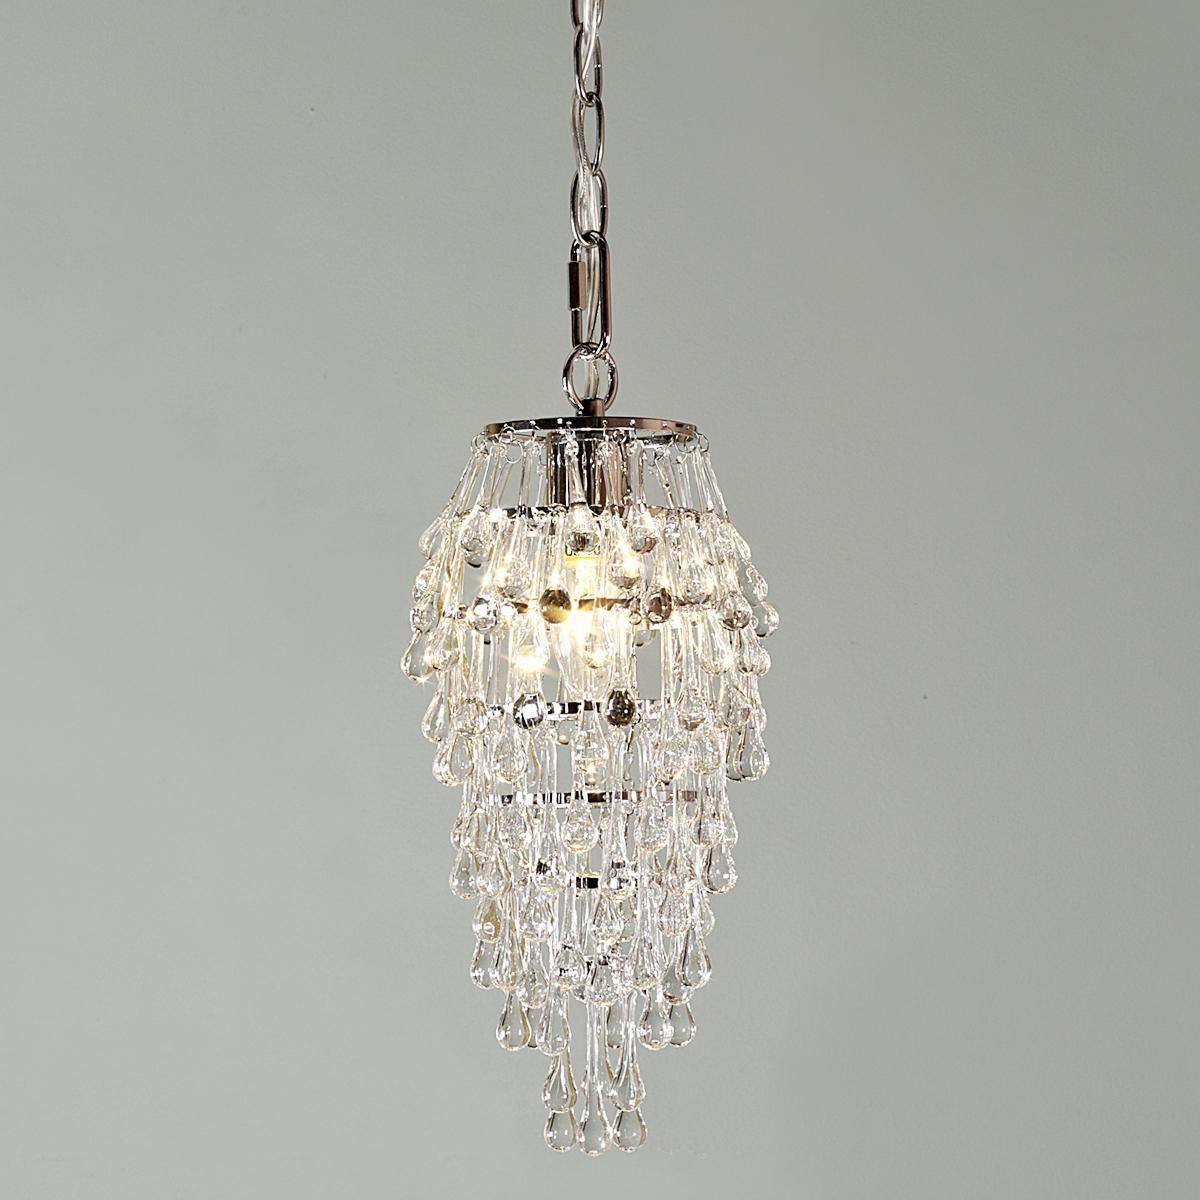 Raindrop Crystal Pendant Shades Of Light 1 100 Watt 10 Chain Rating Printable Ver Crystal Pendant Lighting Glass Pendant Shades Crystal Pendant